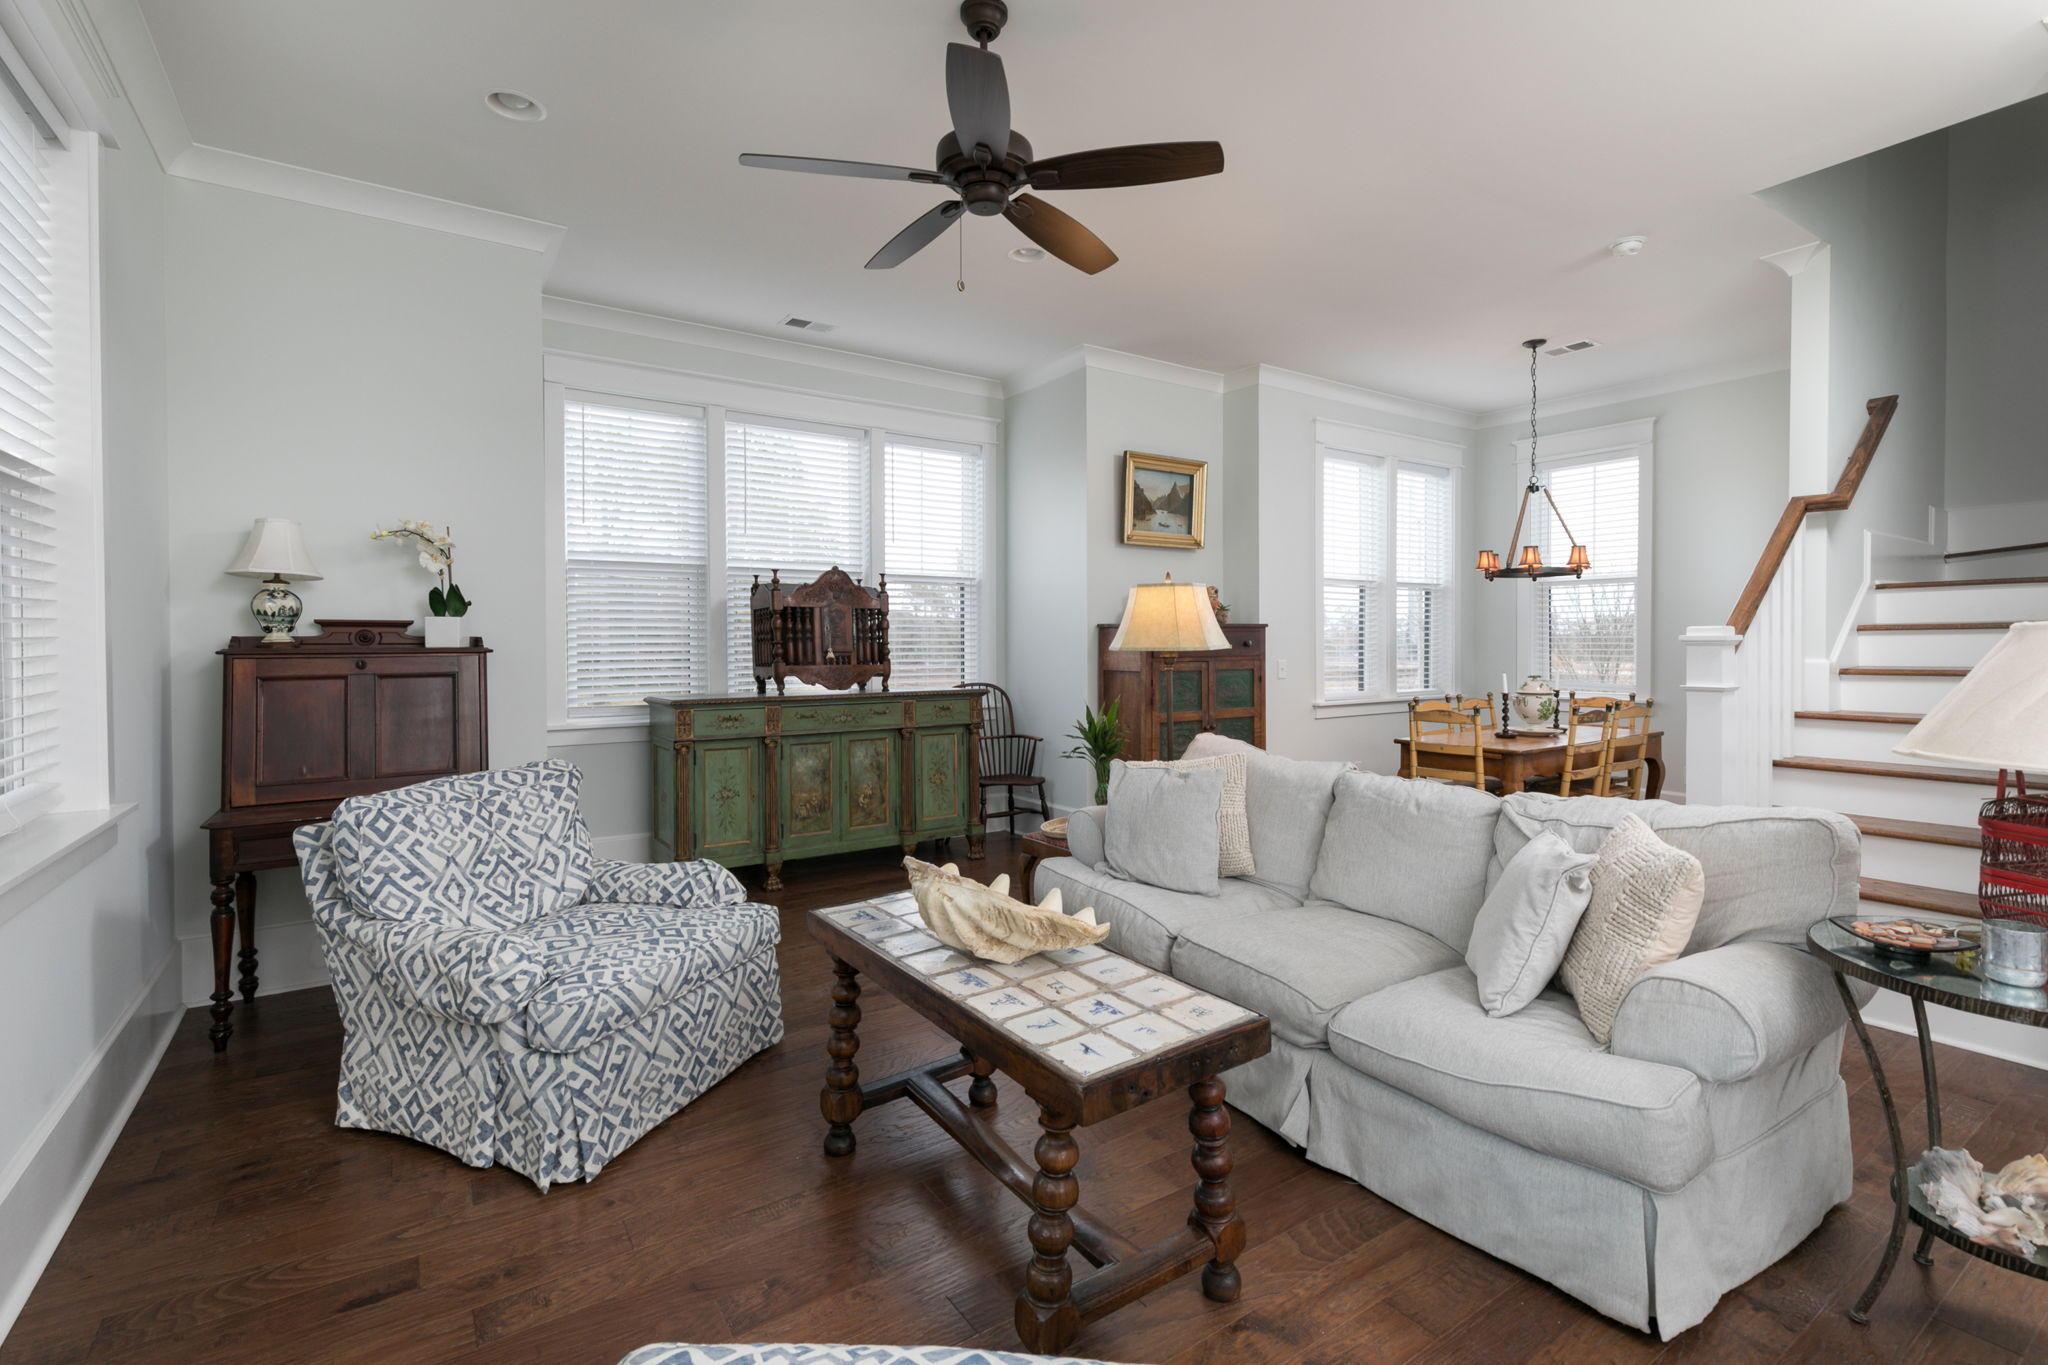 Sullivans Pointe Homes For Sale - 954 Key Colony, Mount Pleasant, SC - 28